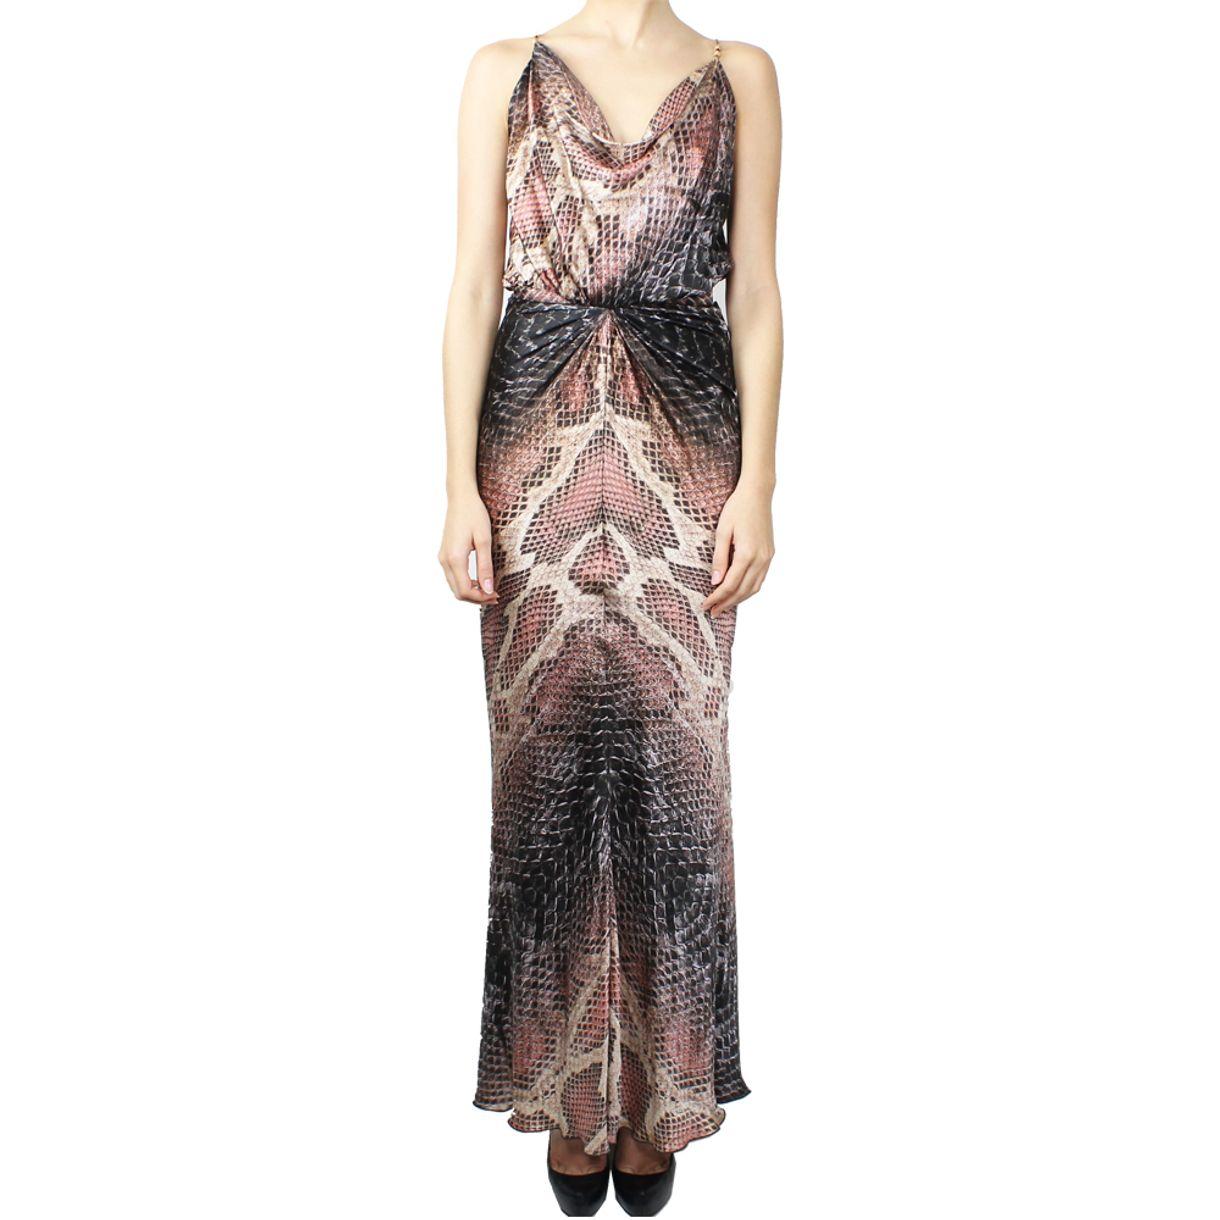 8368-vestido-roberto-cavalli-cobra-longo-1